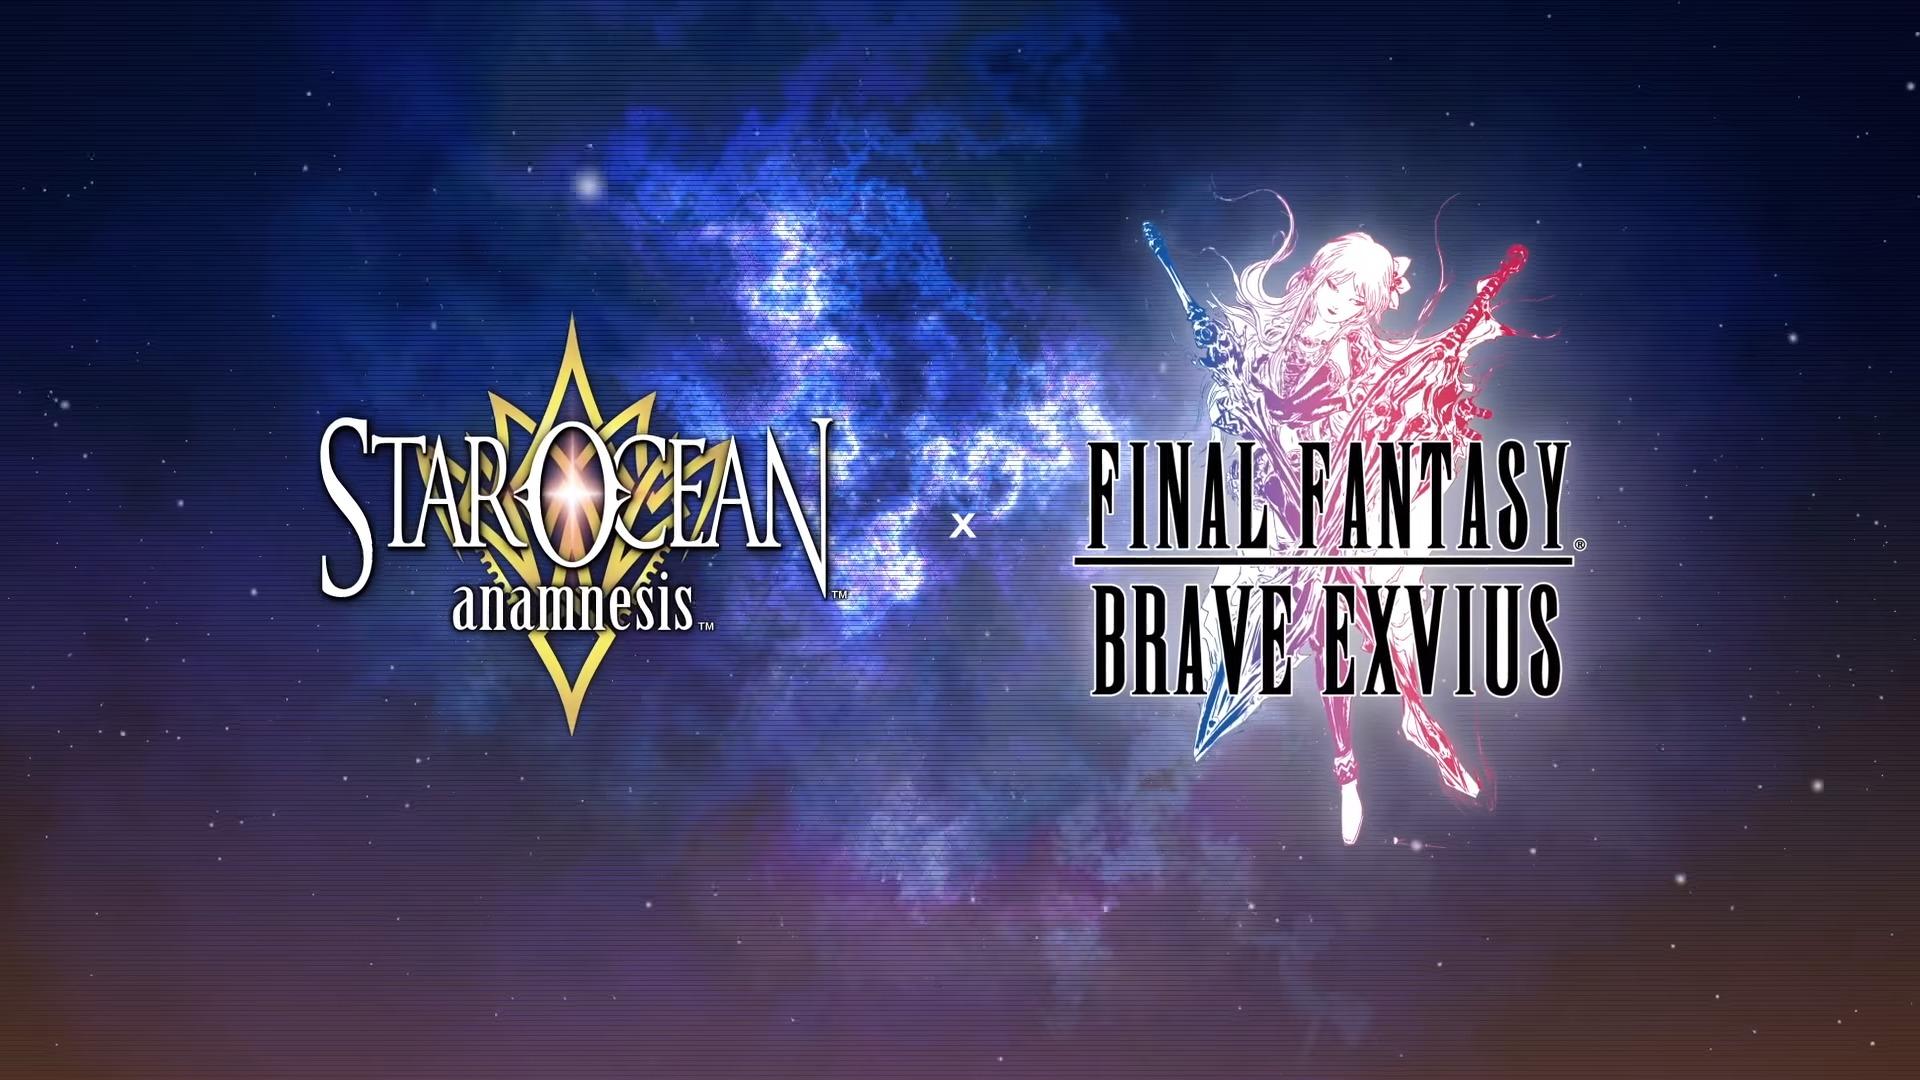 The Final Fantasy Brave Exvius X Star Ocean Anamnesis Crossover